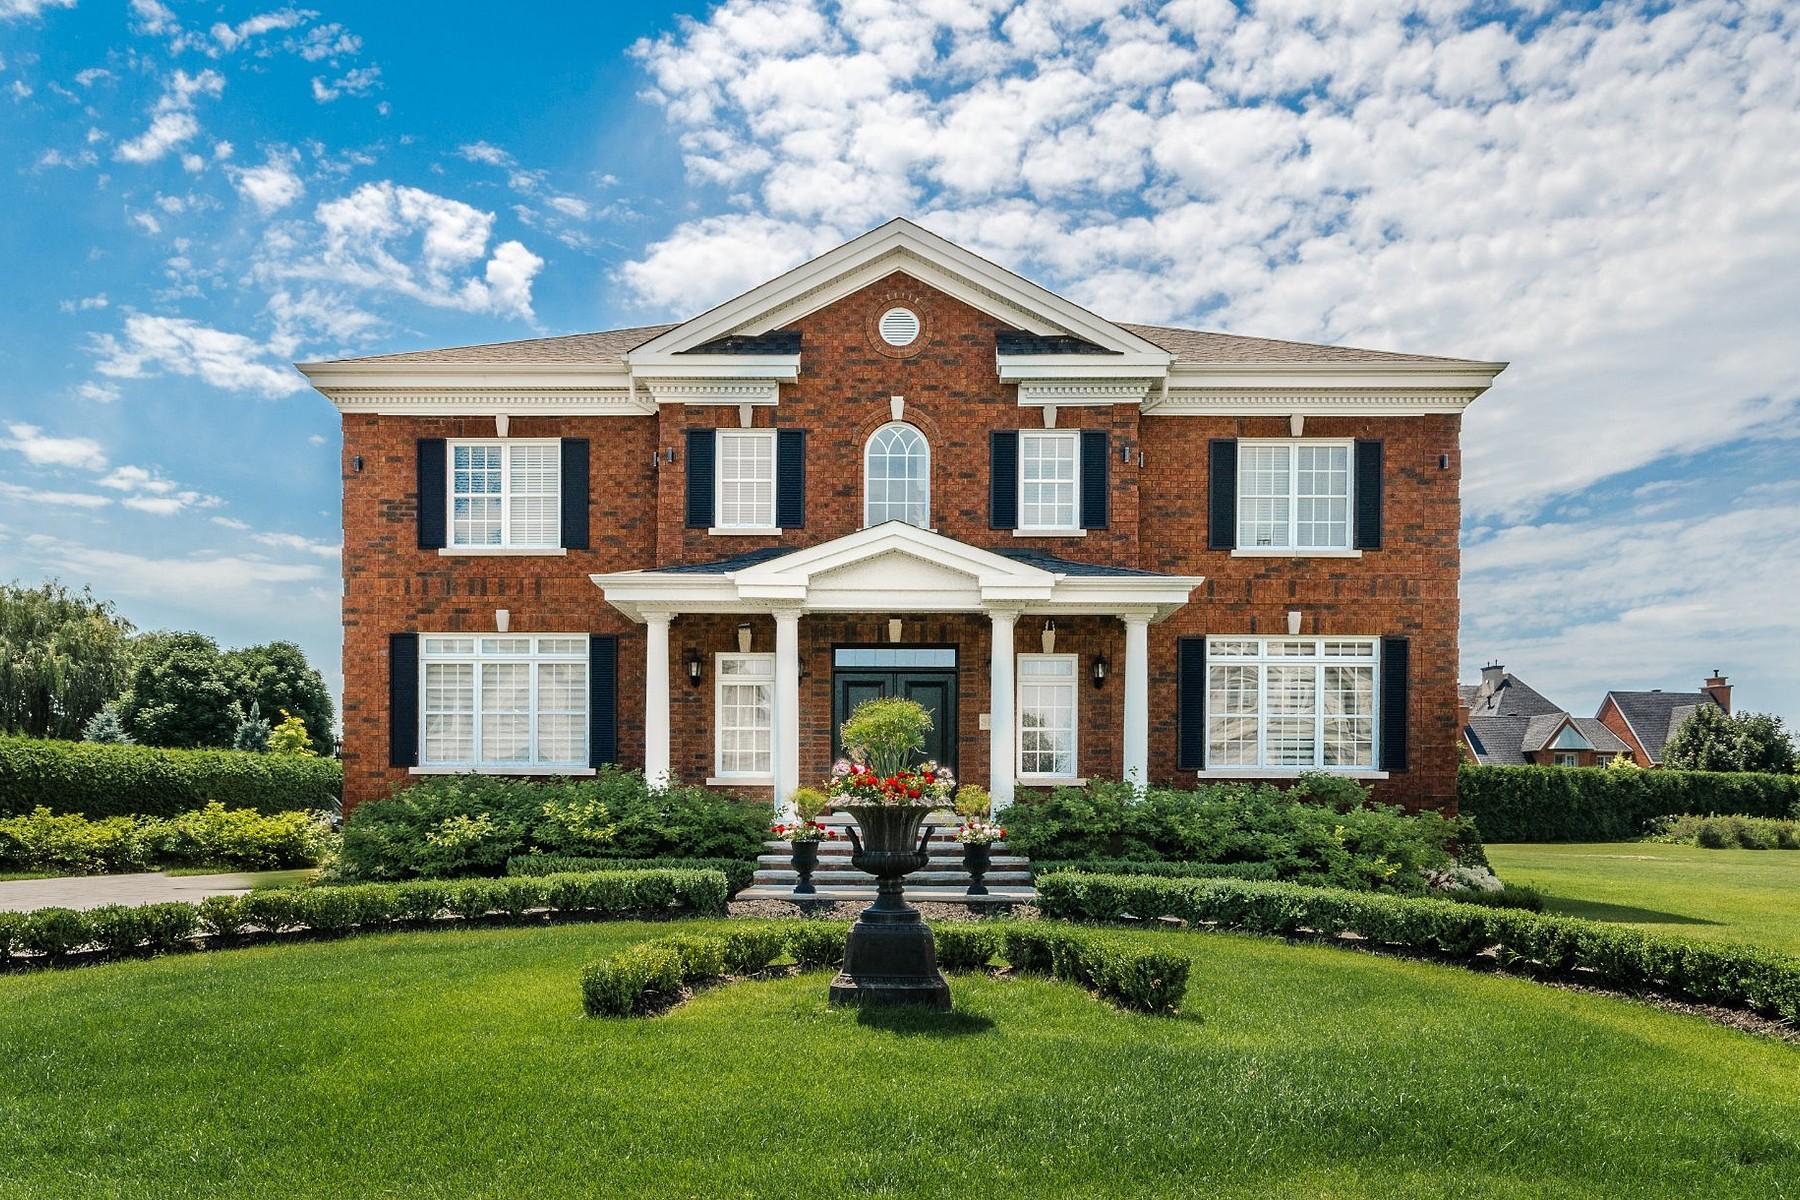 Single Family Homes for Sale at Brossard, Montérégie 3625 Rue de Lisbonne Brossard, Quebec J4Y3G2 Canada